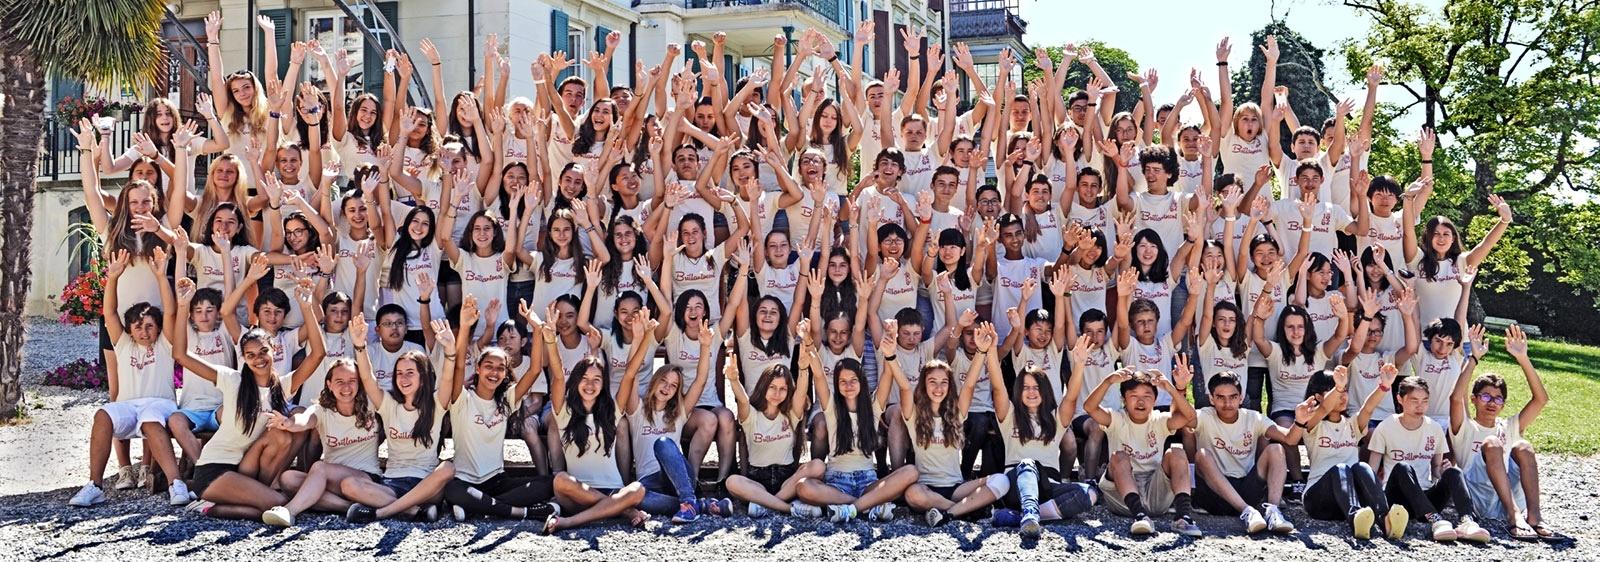 213-Group-Brillantmont-Summer-Course